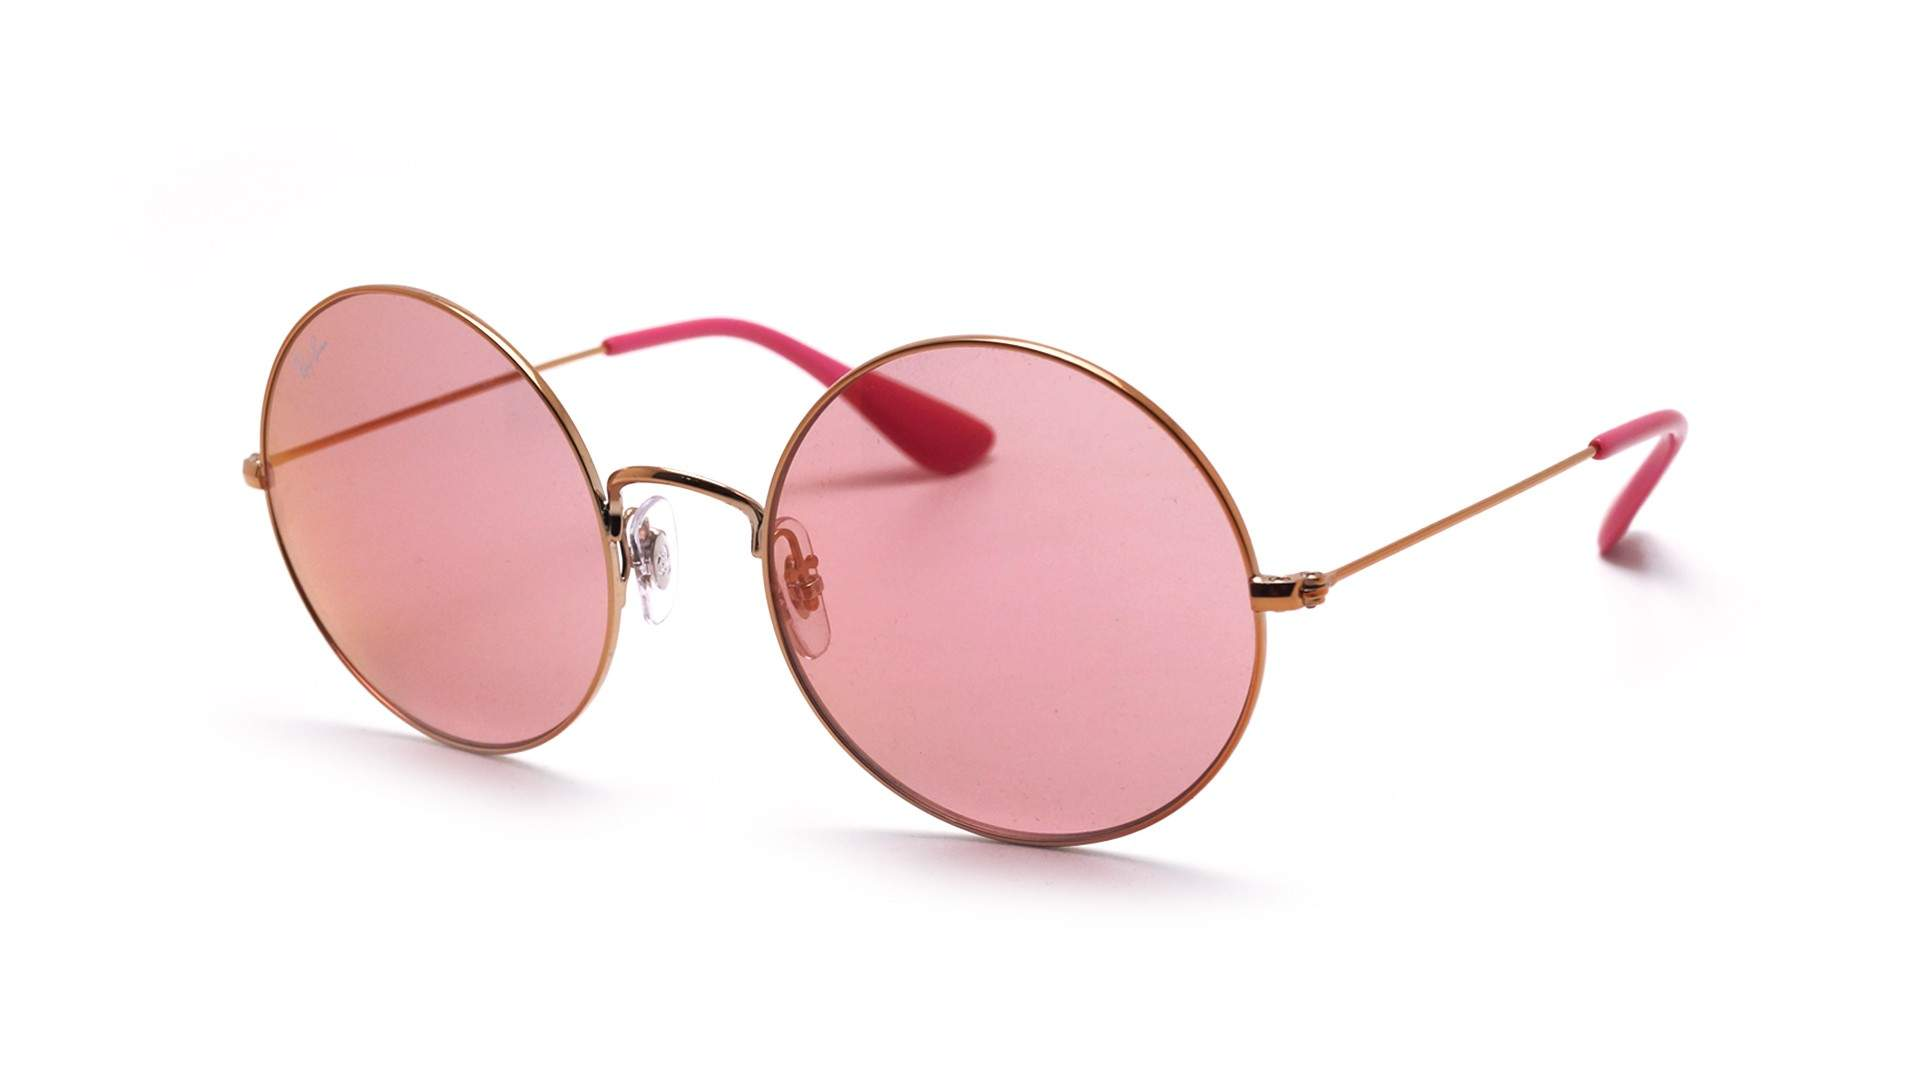 46edfb4abda Sunglasses Ray-Ban Ja-jo Copper RB3592 9035 F6 50-20 Medium